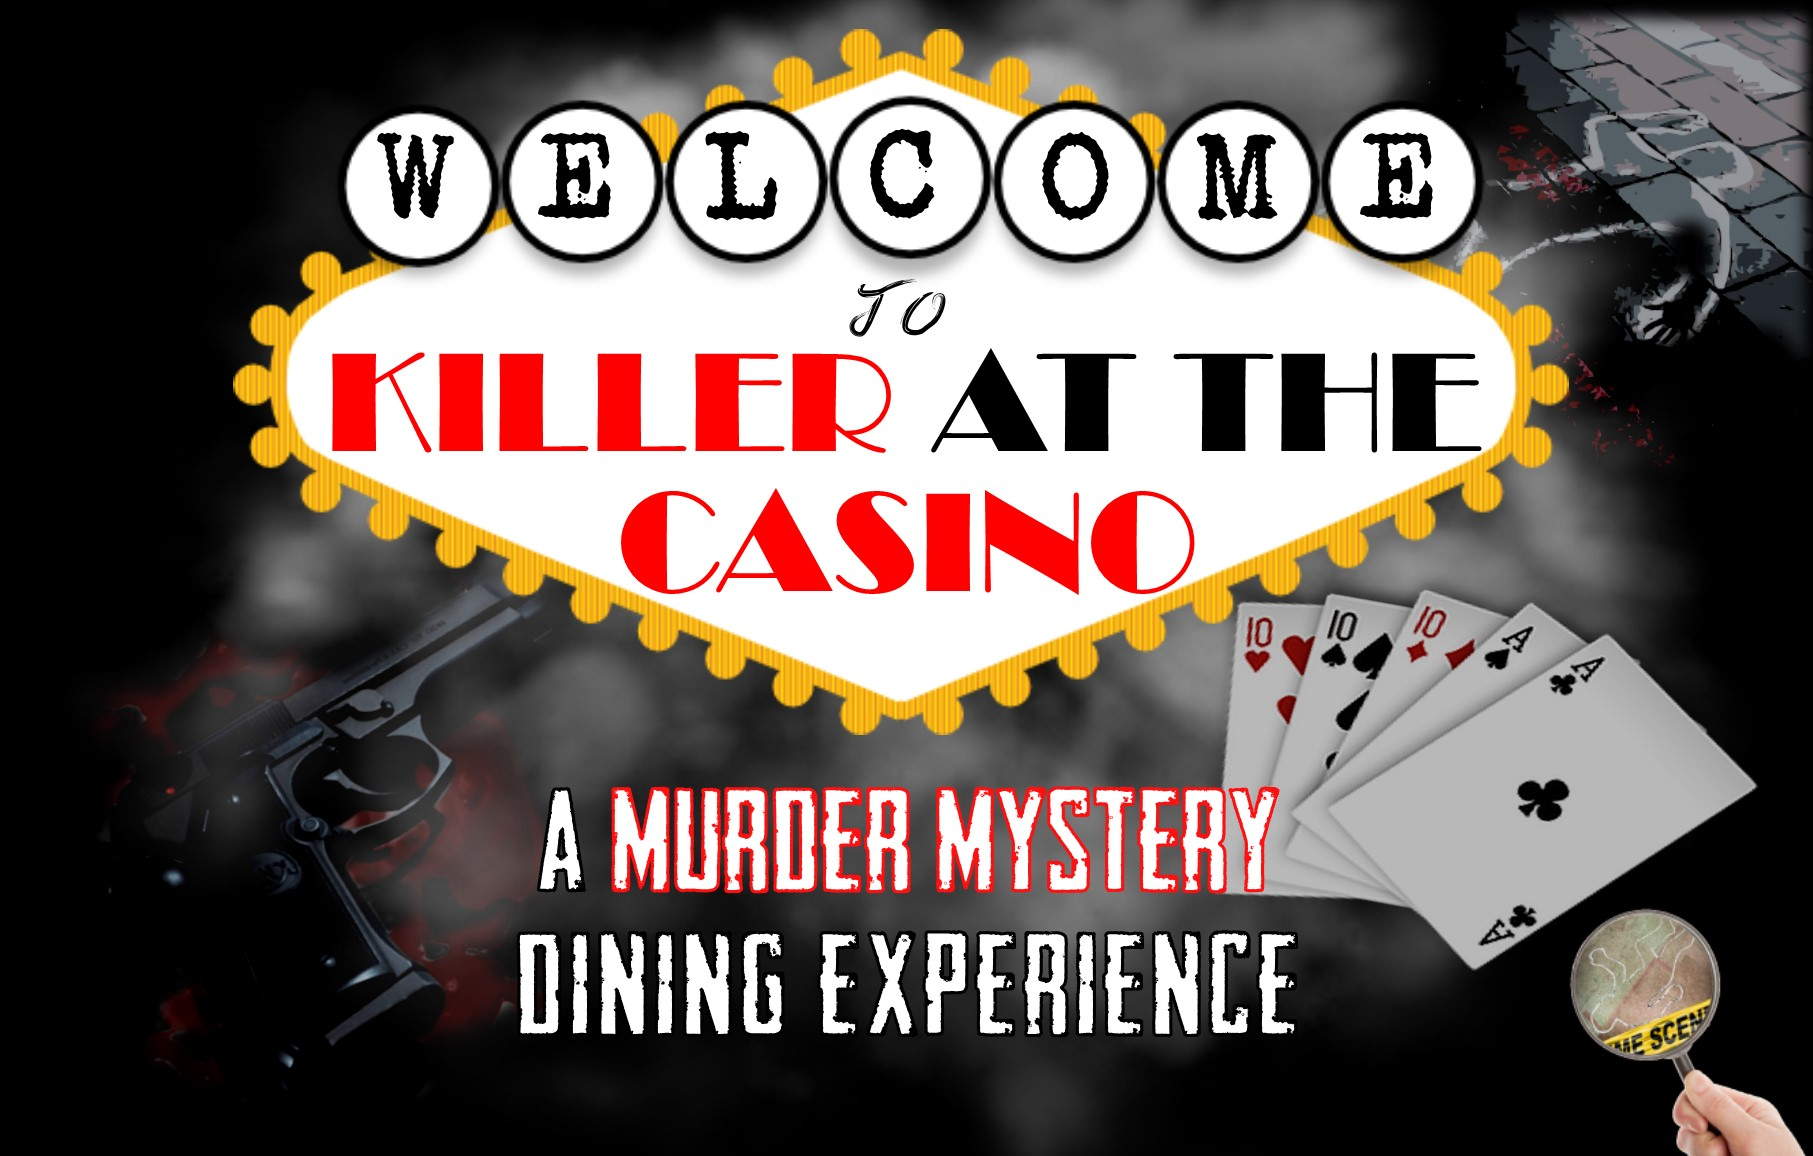 Killer at the Casino